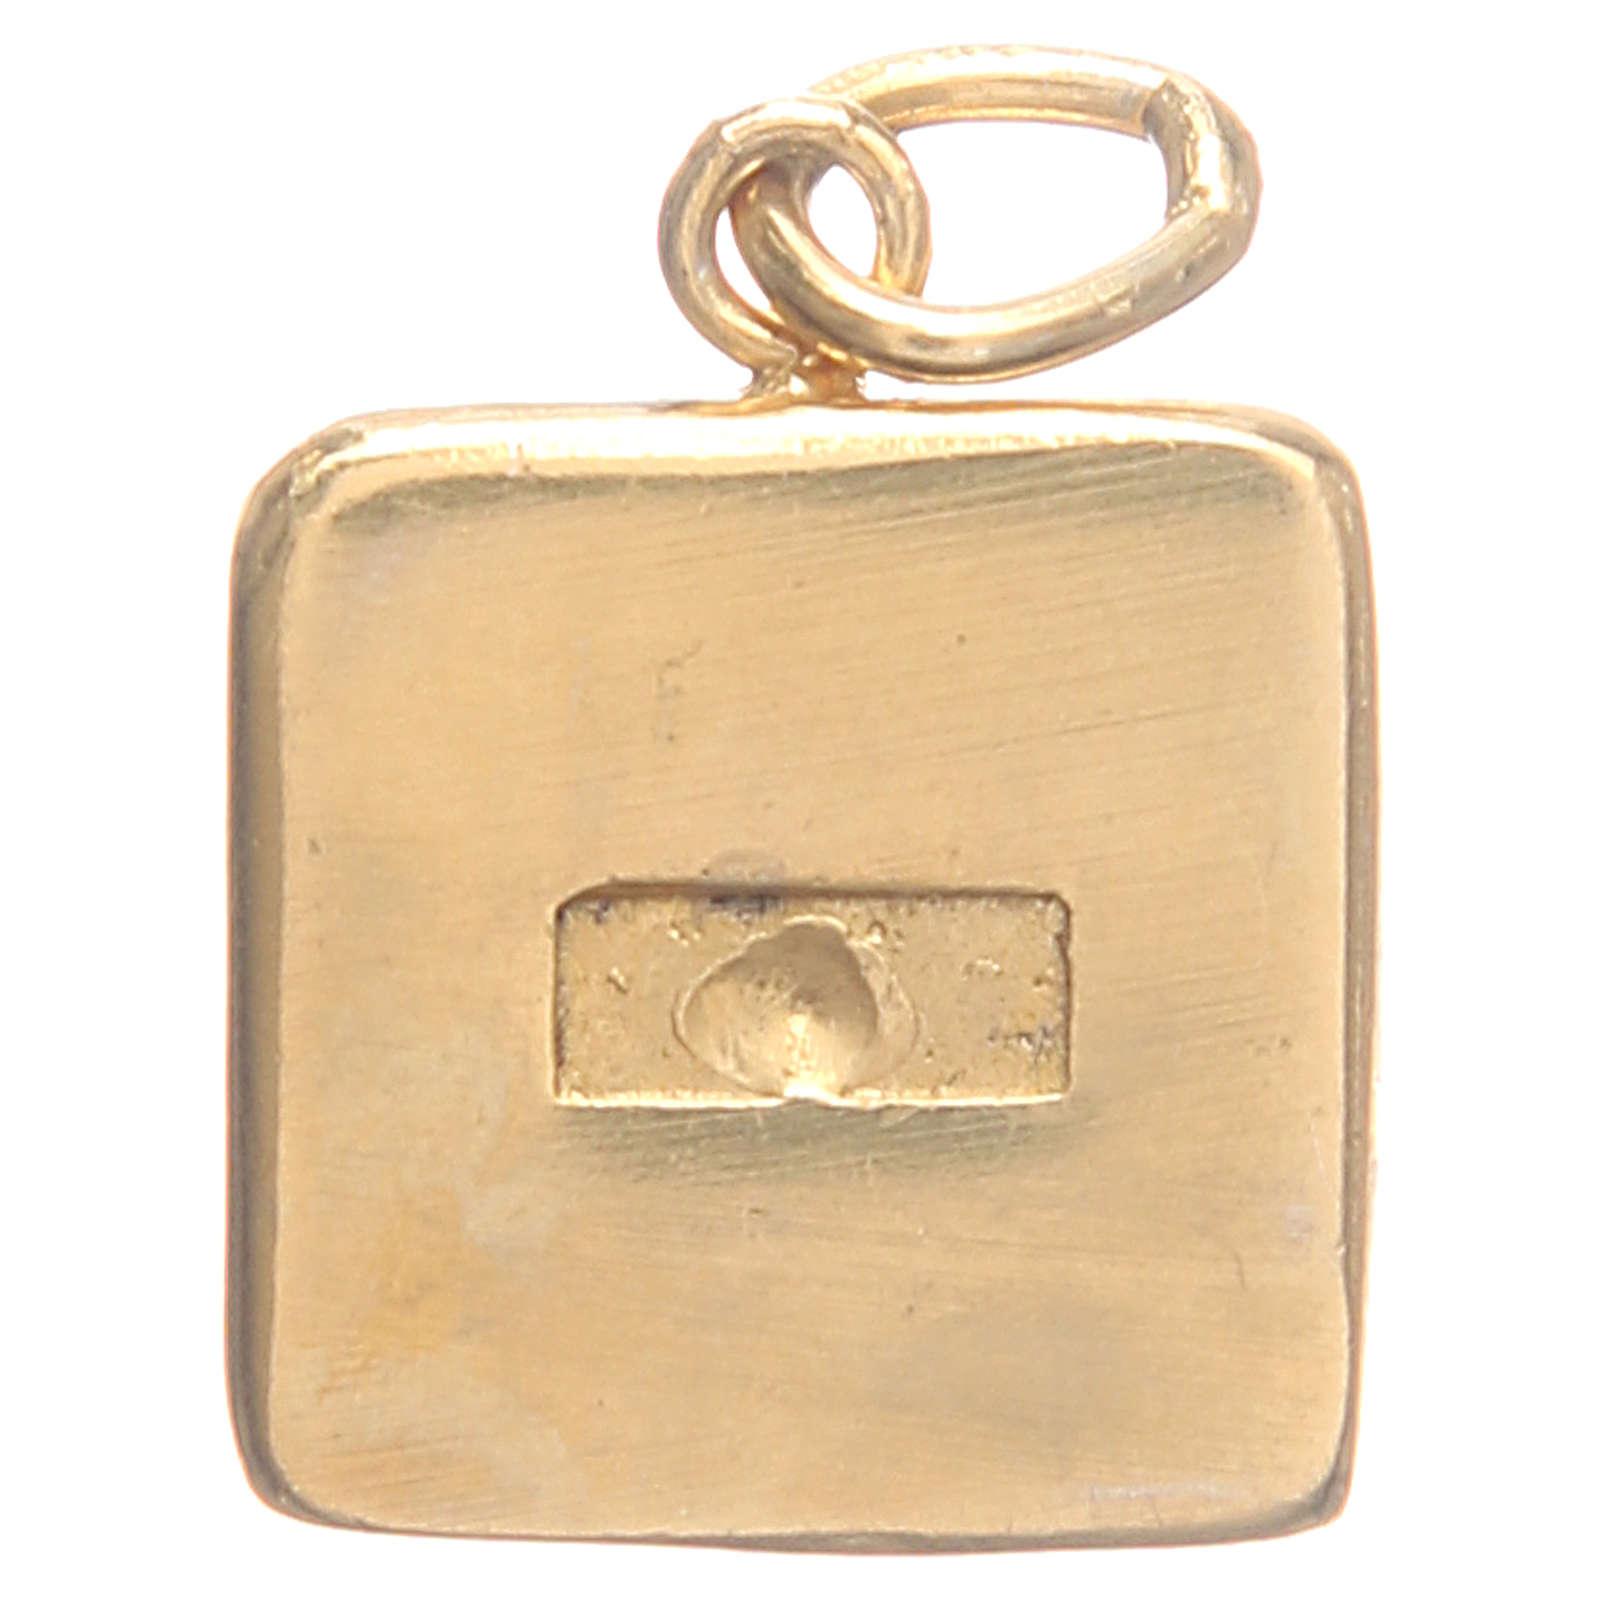 Medalha prata 800 Chaves Vaticano 1,5x1,5 cm 4